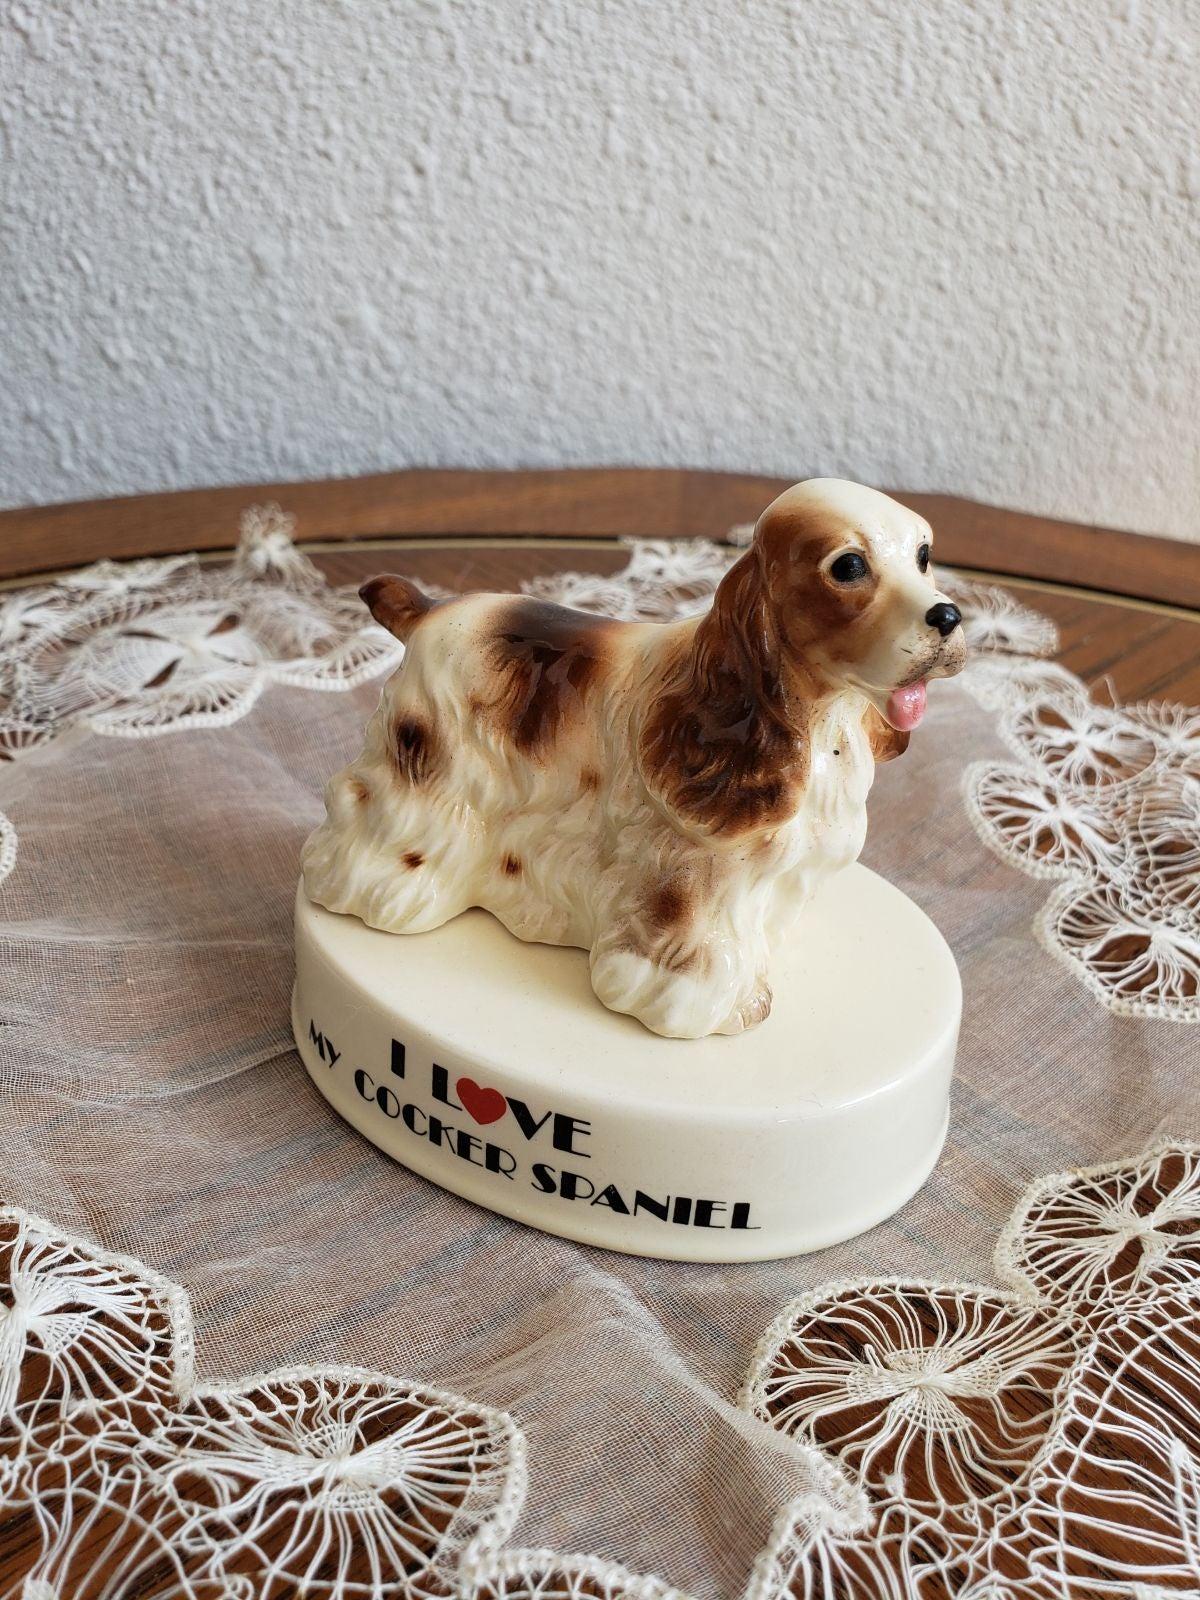 I LOVE MY COCKER  SPANIEL  porcelain dog